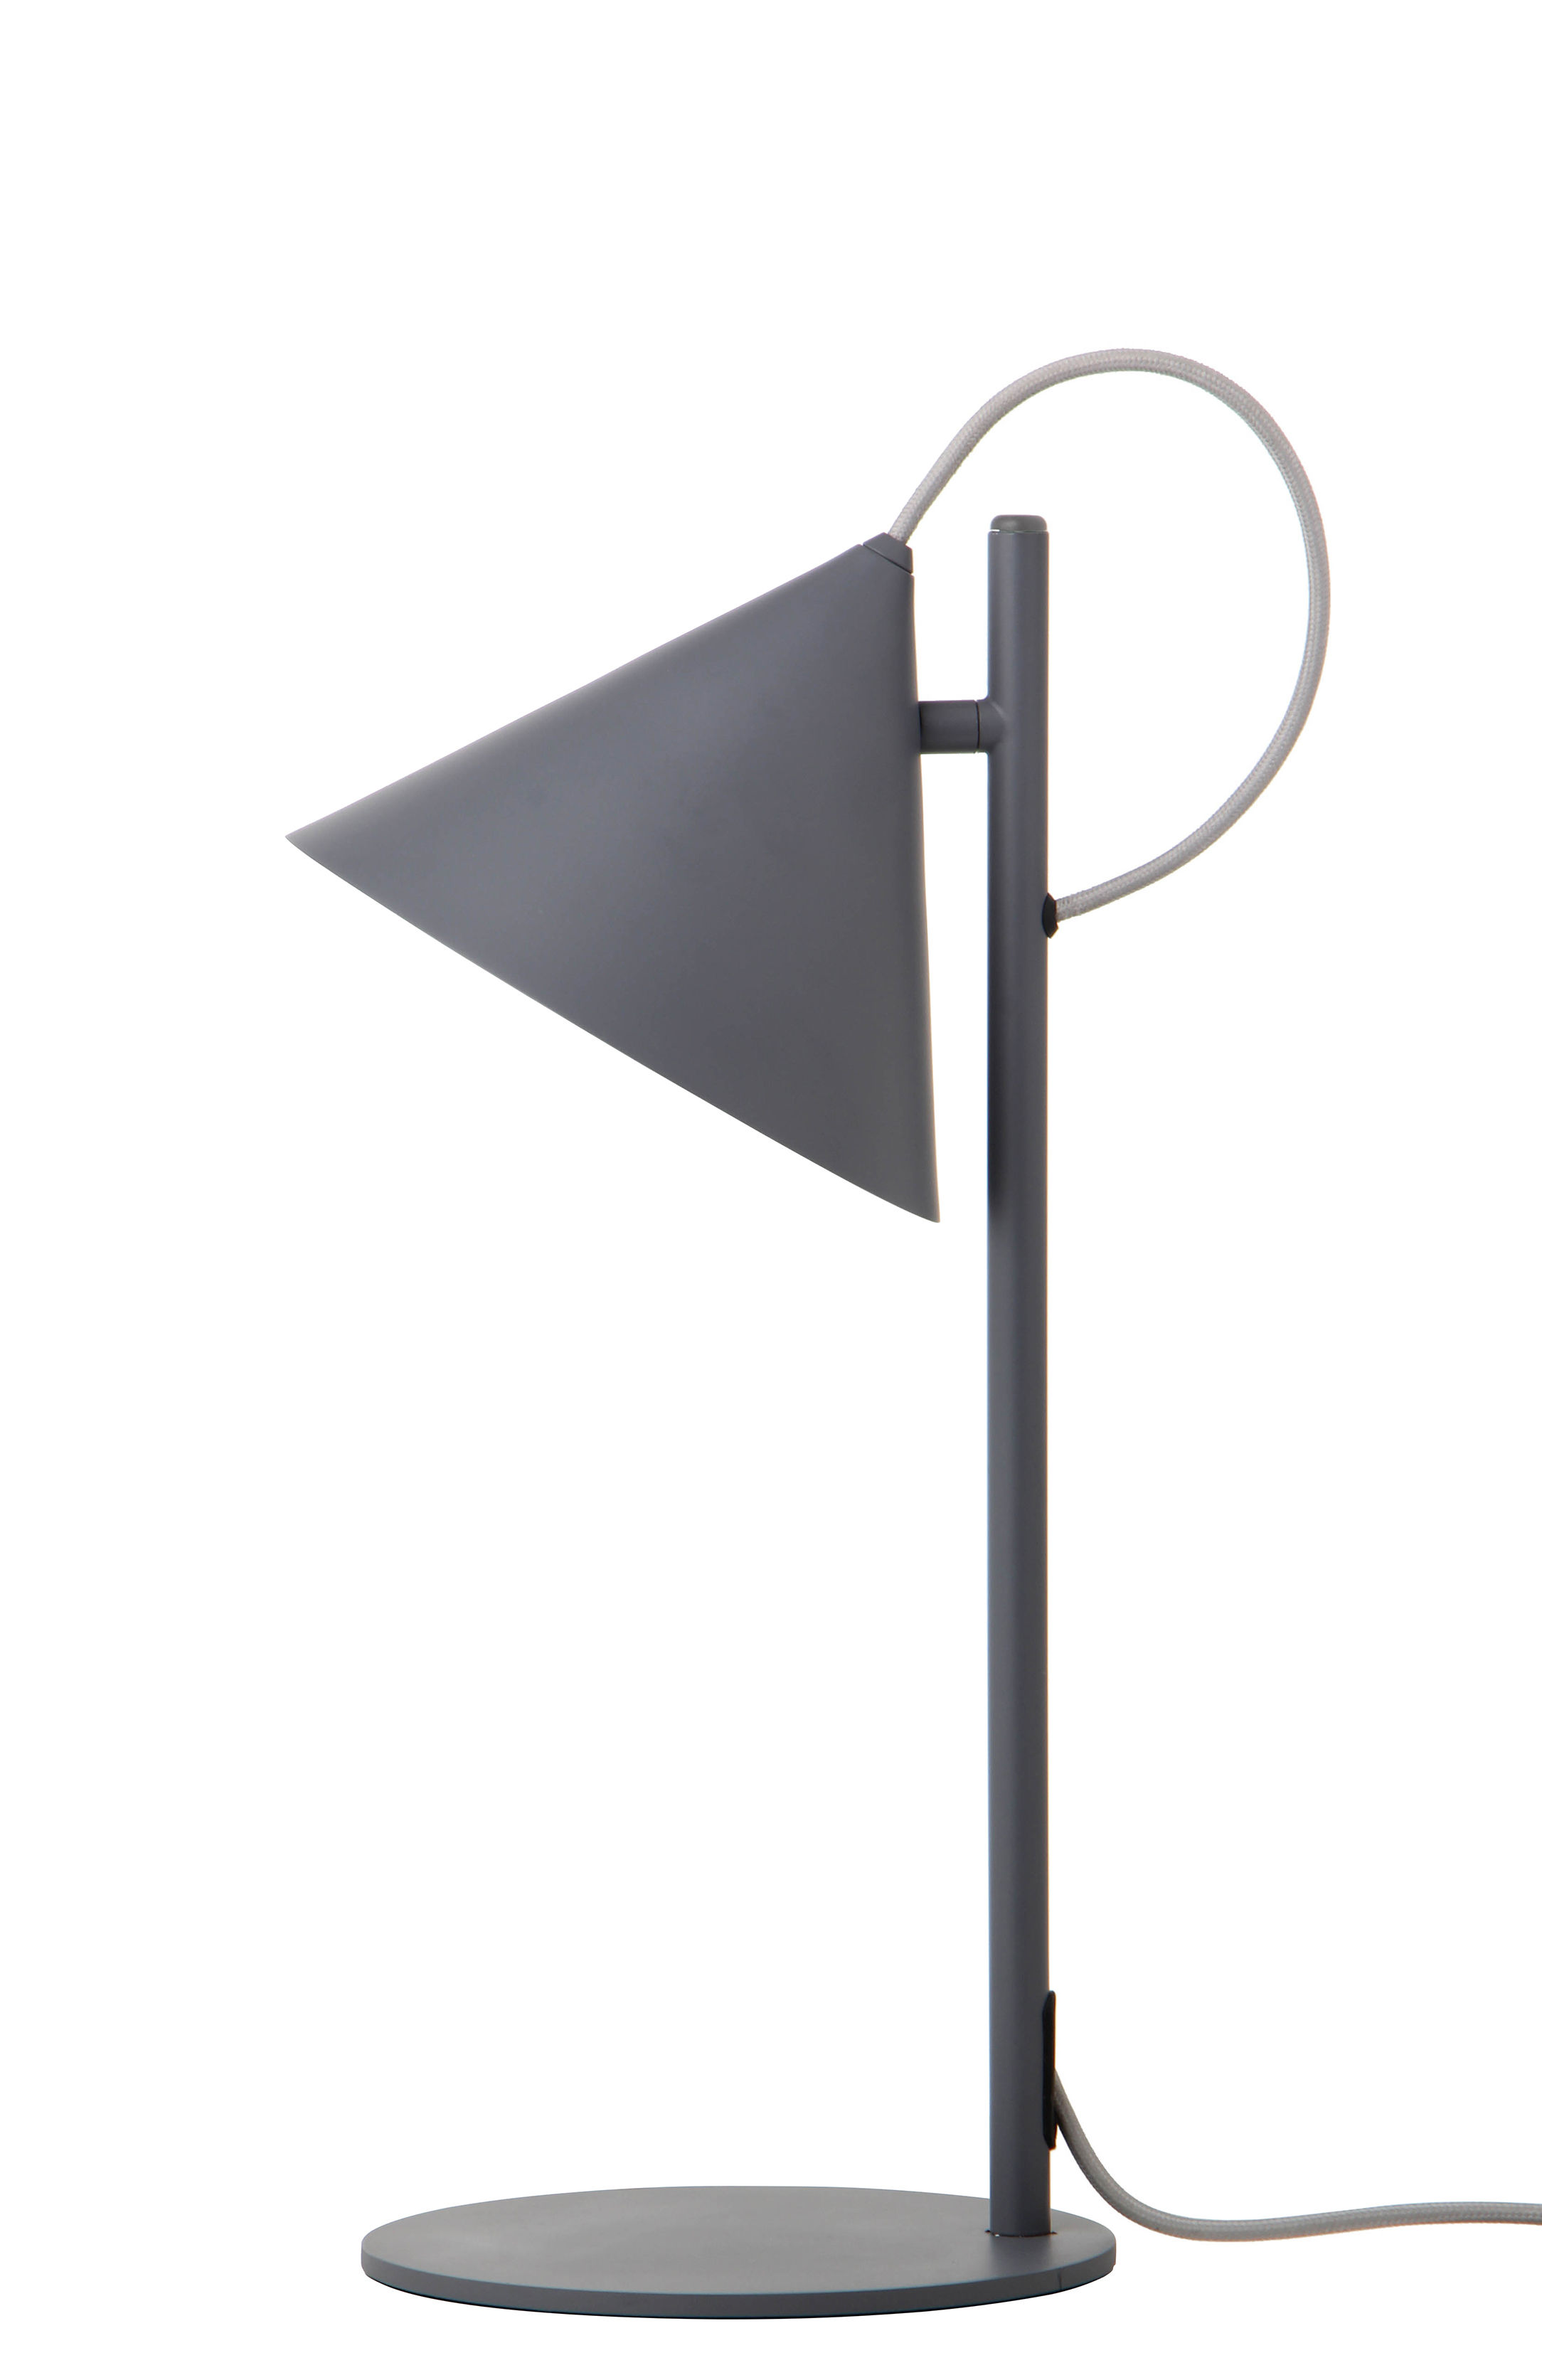 Luminaire - Lampes de table - Lampe de table Benjamin - Frandsen - Gris mat - Métal peint